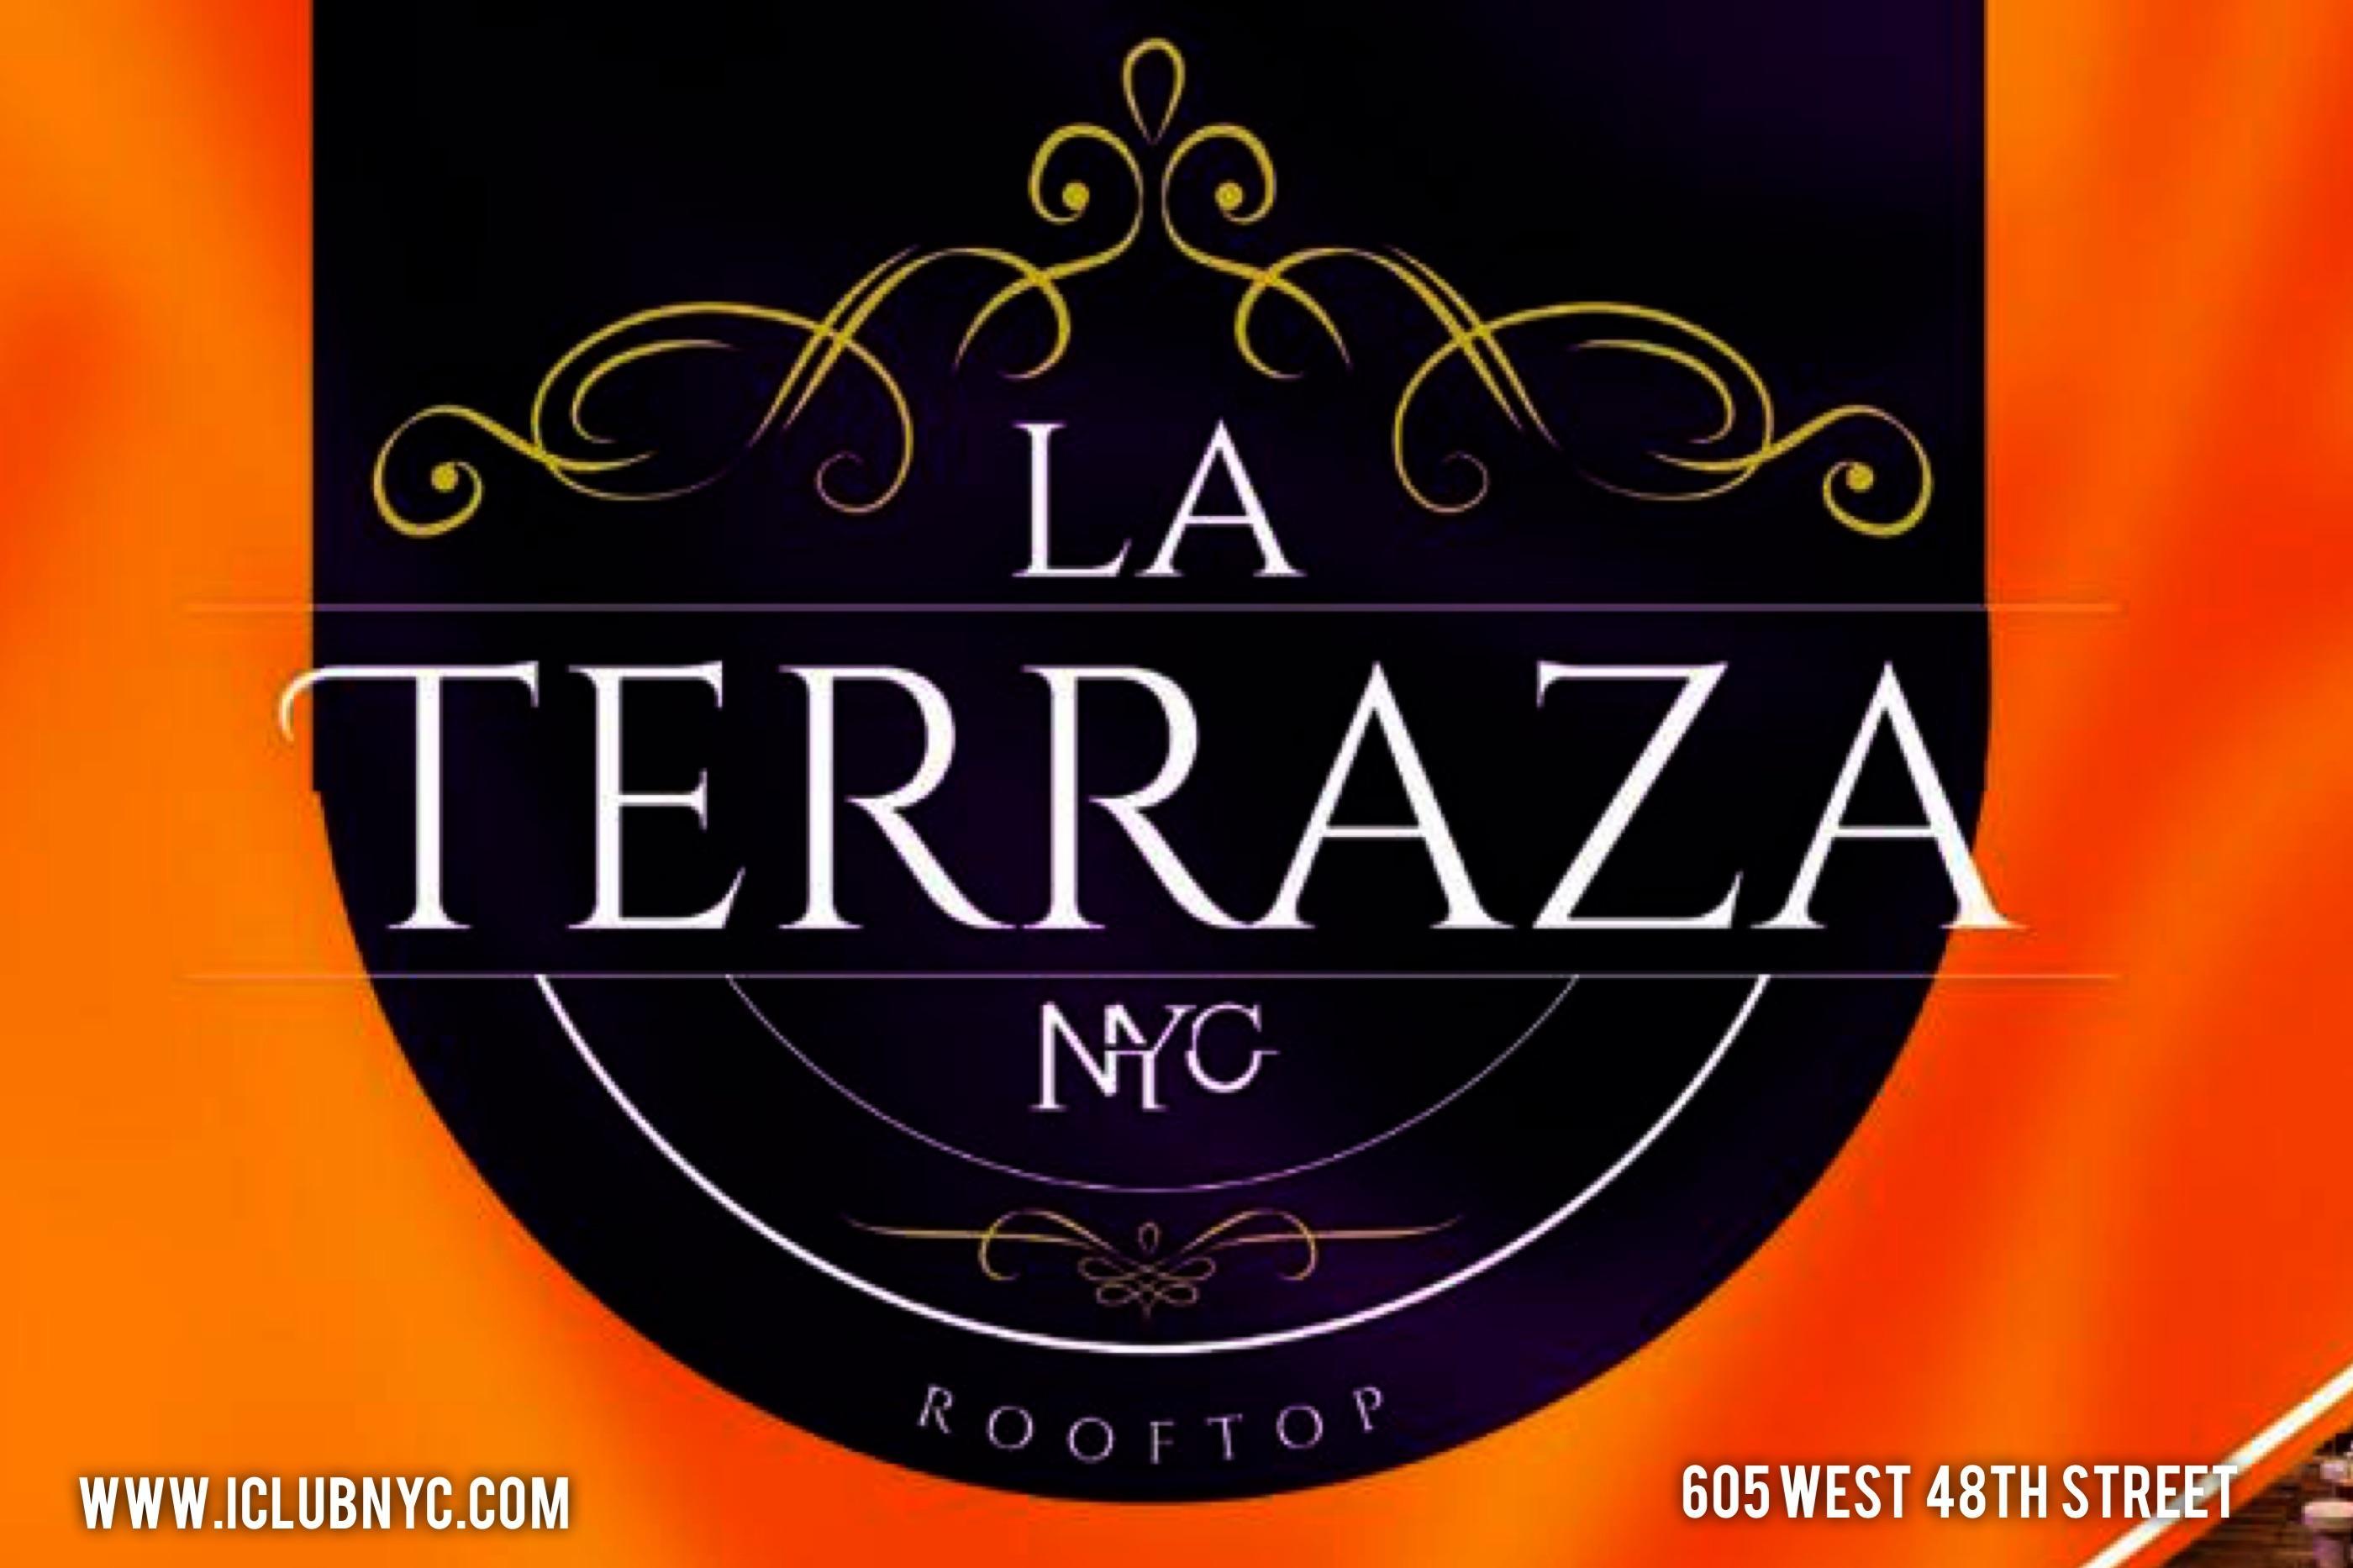 NYC #1 ROOFTOP PARTY FRIDAYS & SATURDAYS NIGHT | LATIN VIBES